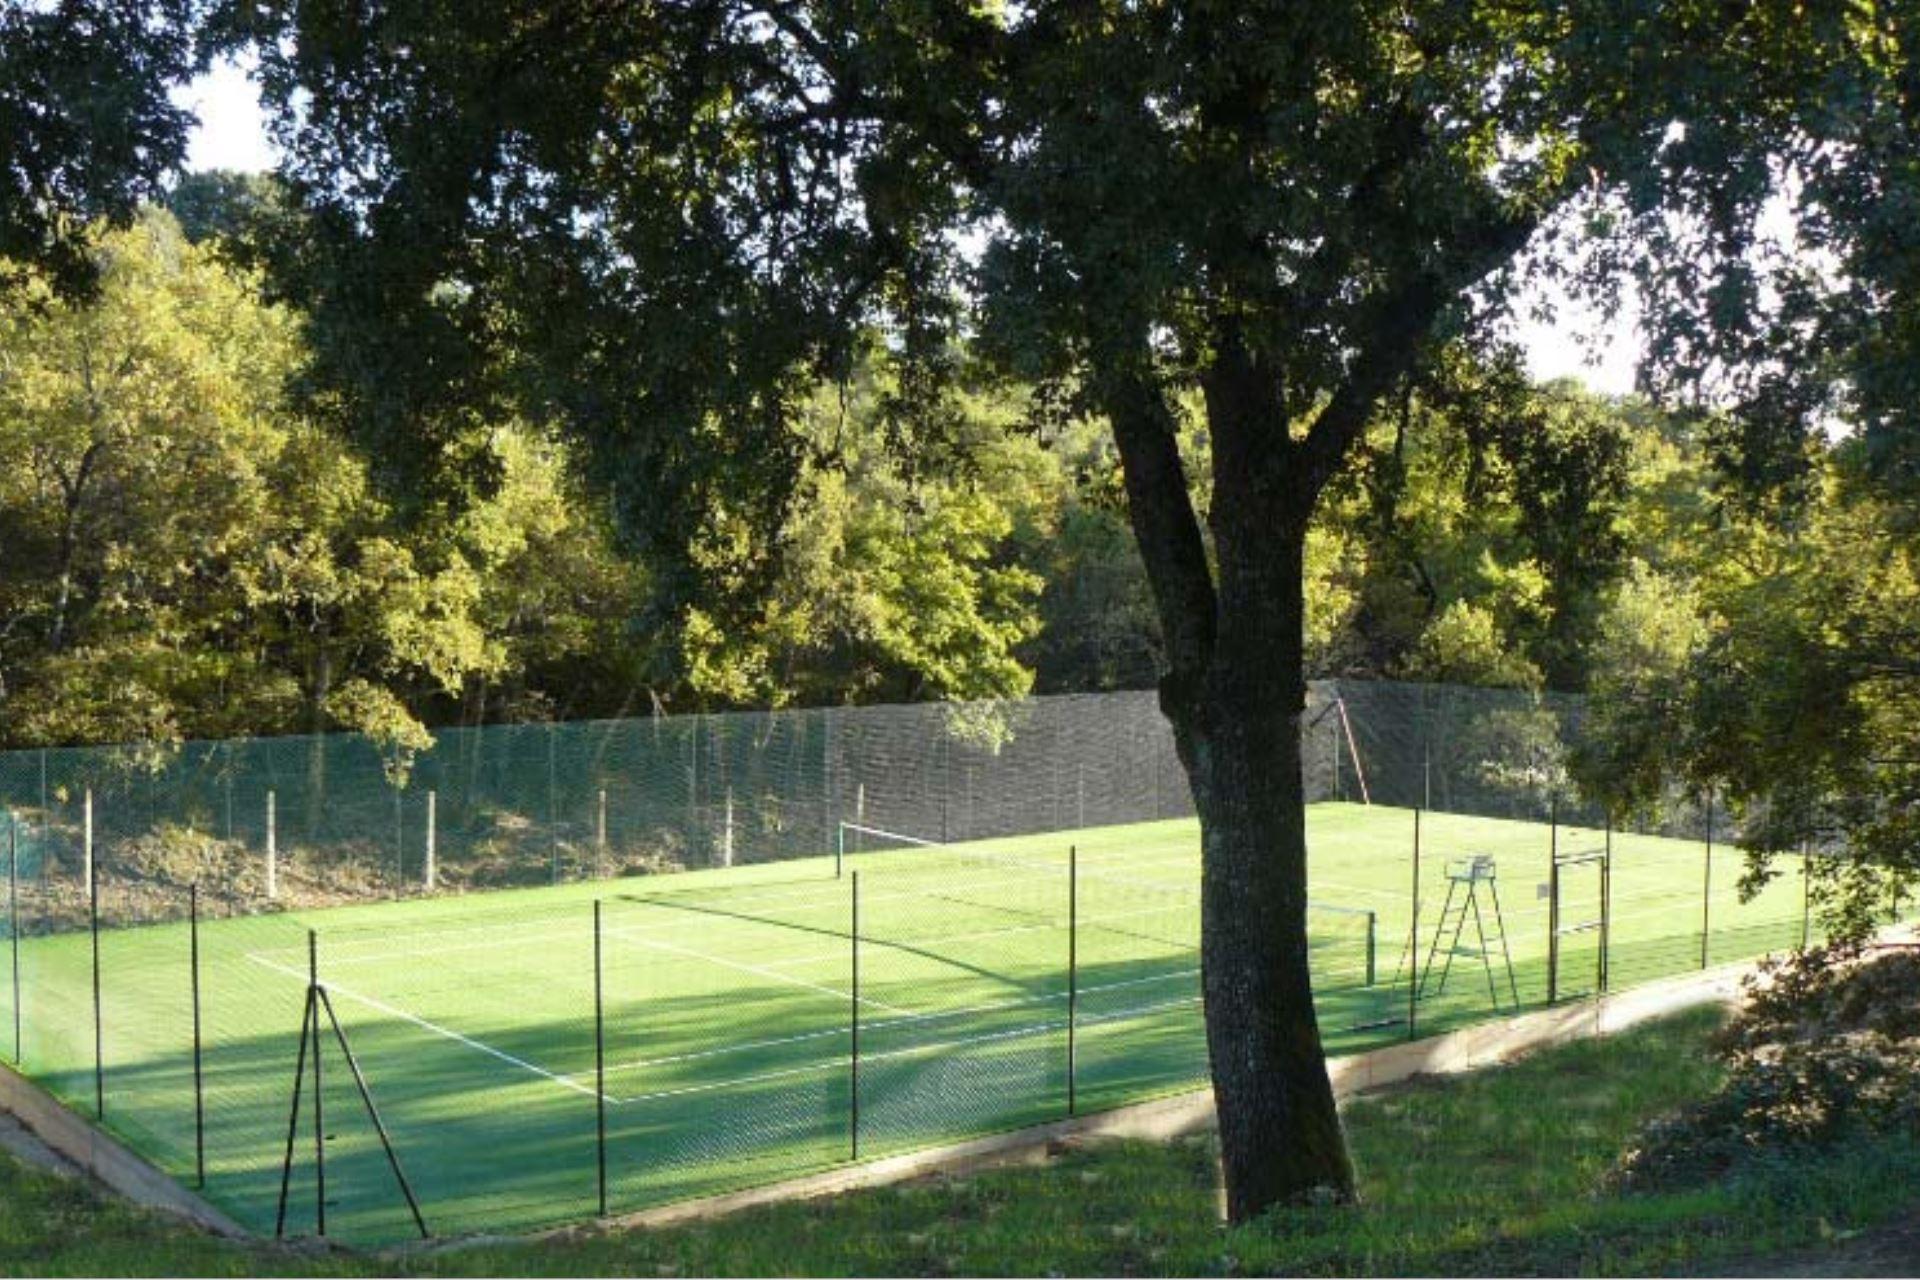 La Pastina : shared tennis court